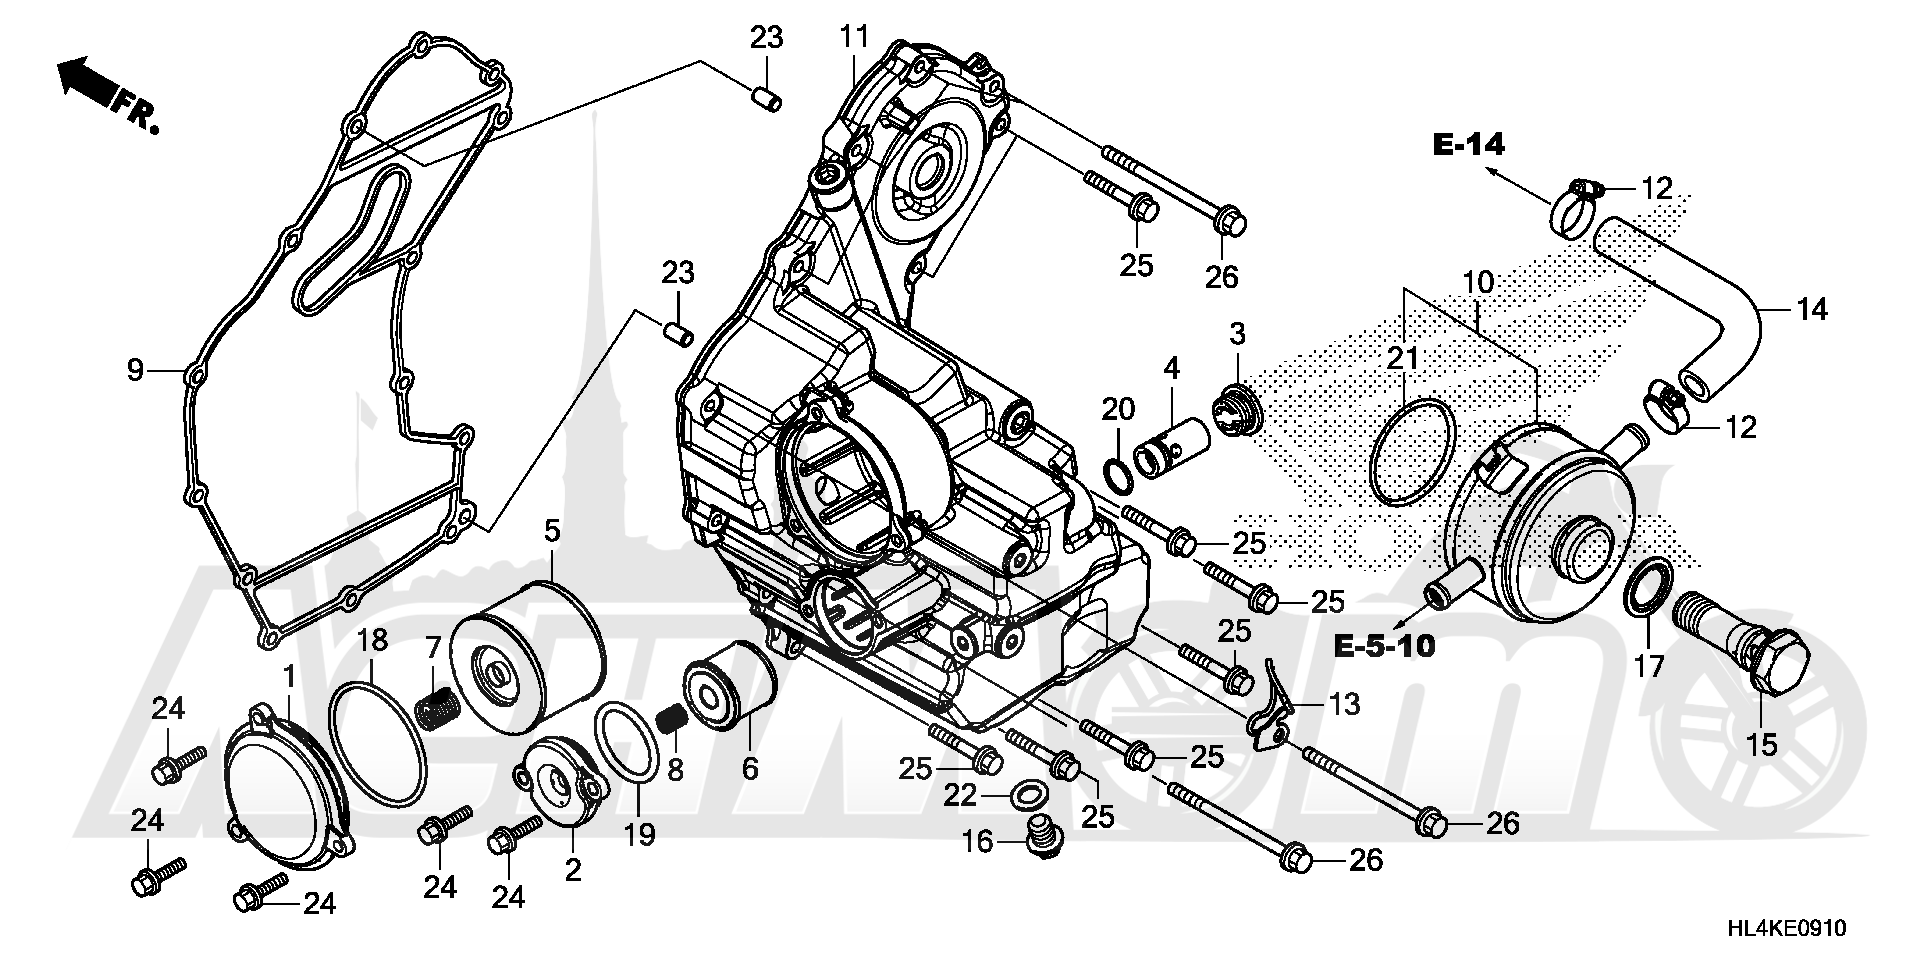 Запчасти для Квадроцикла Honda 2019 SXS1000M5P Раздел: OIL COOLER | маслянный радиатор